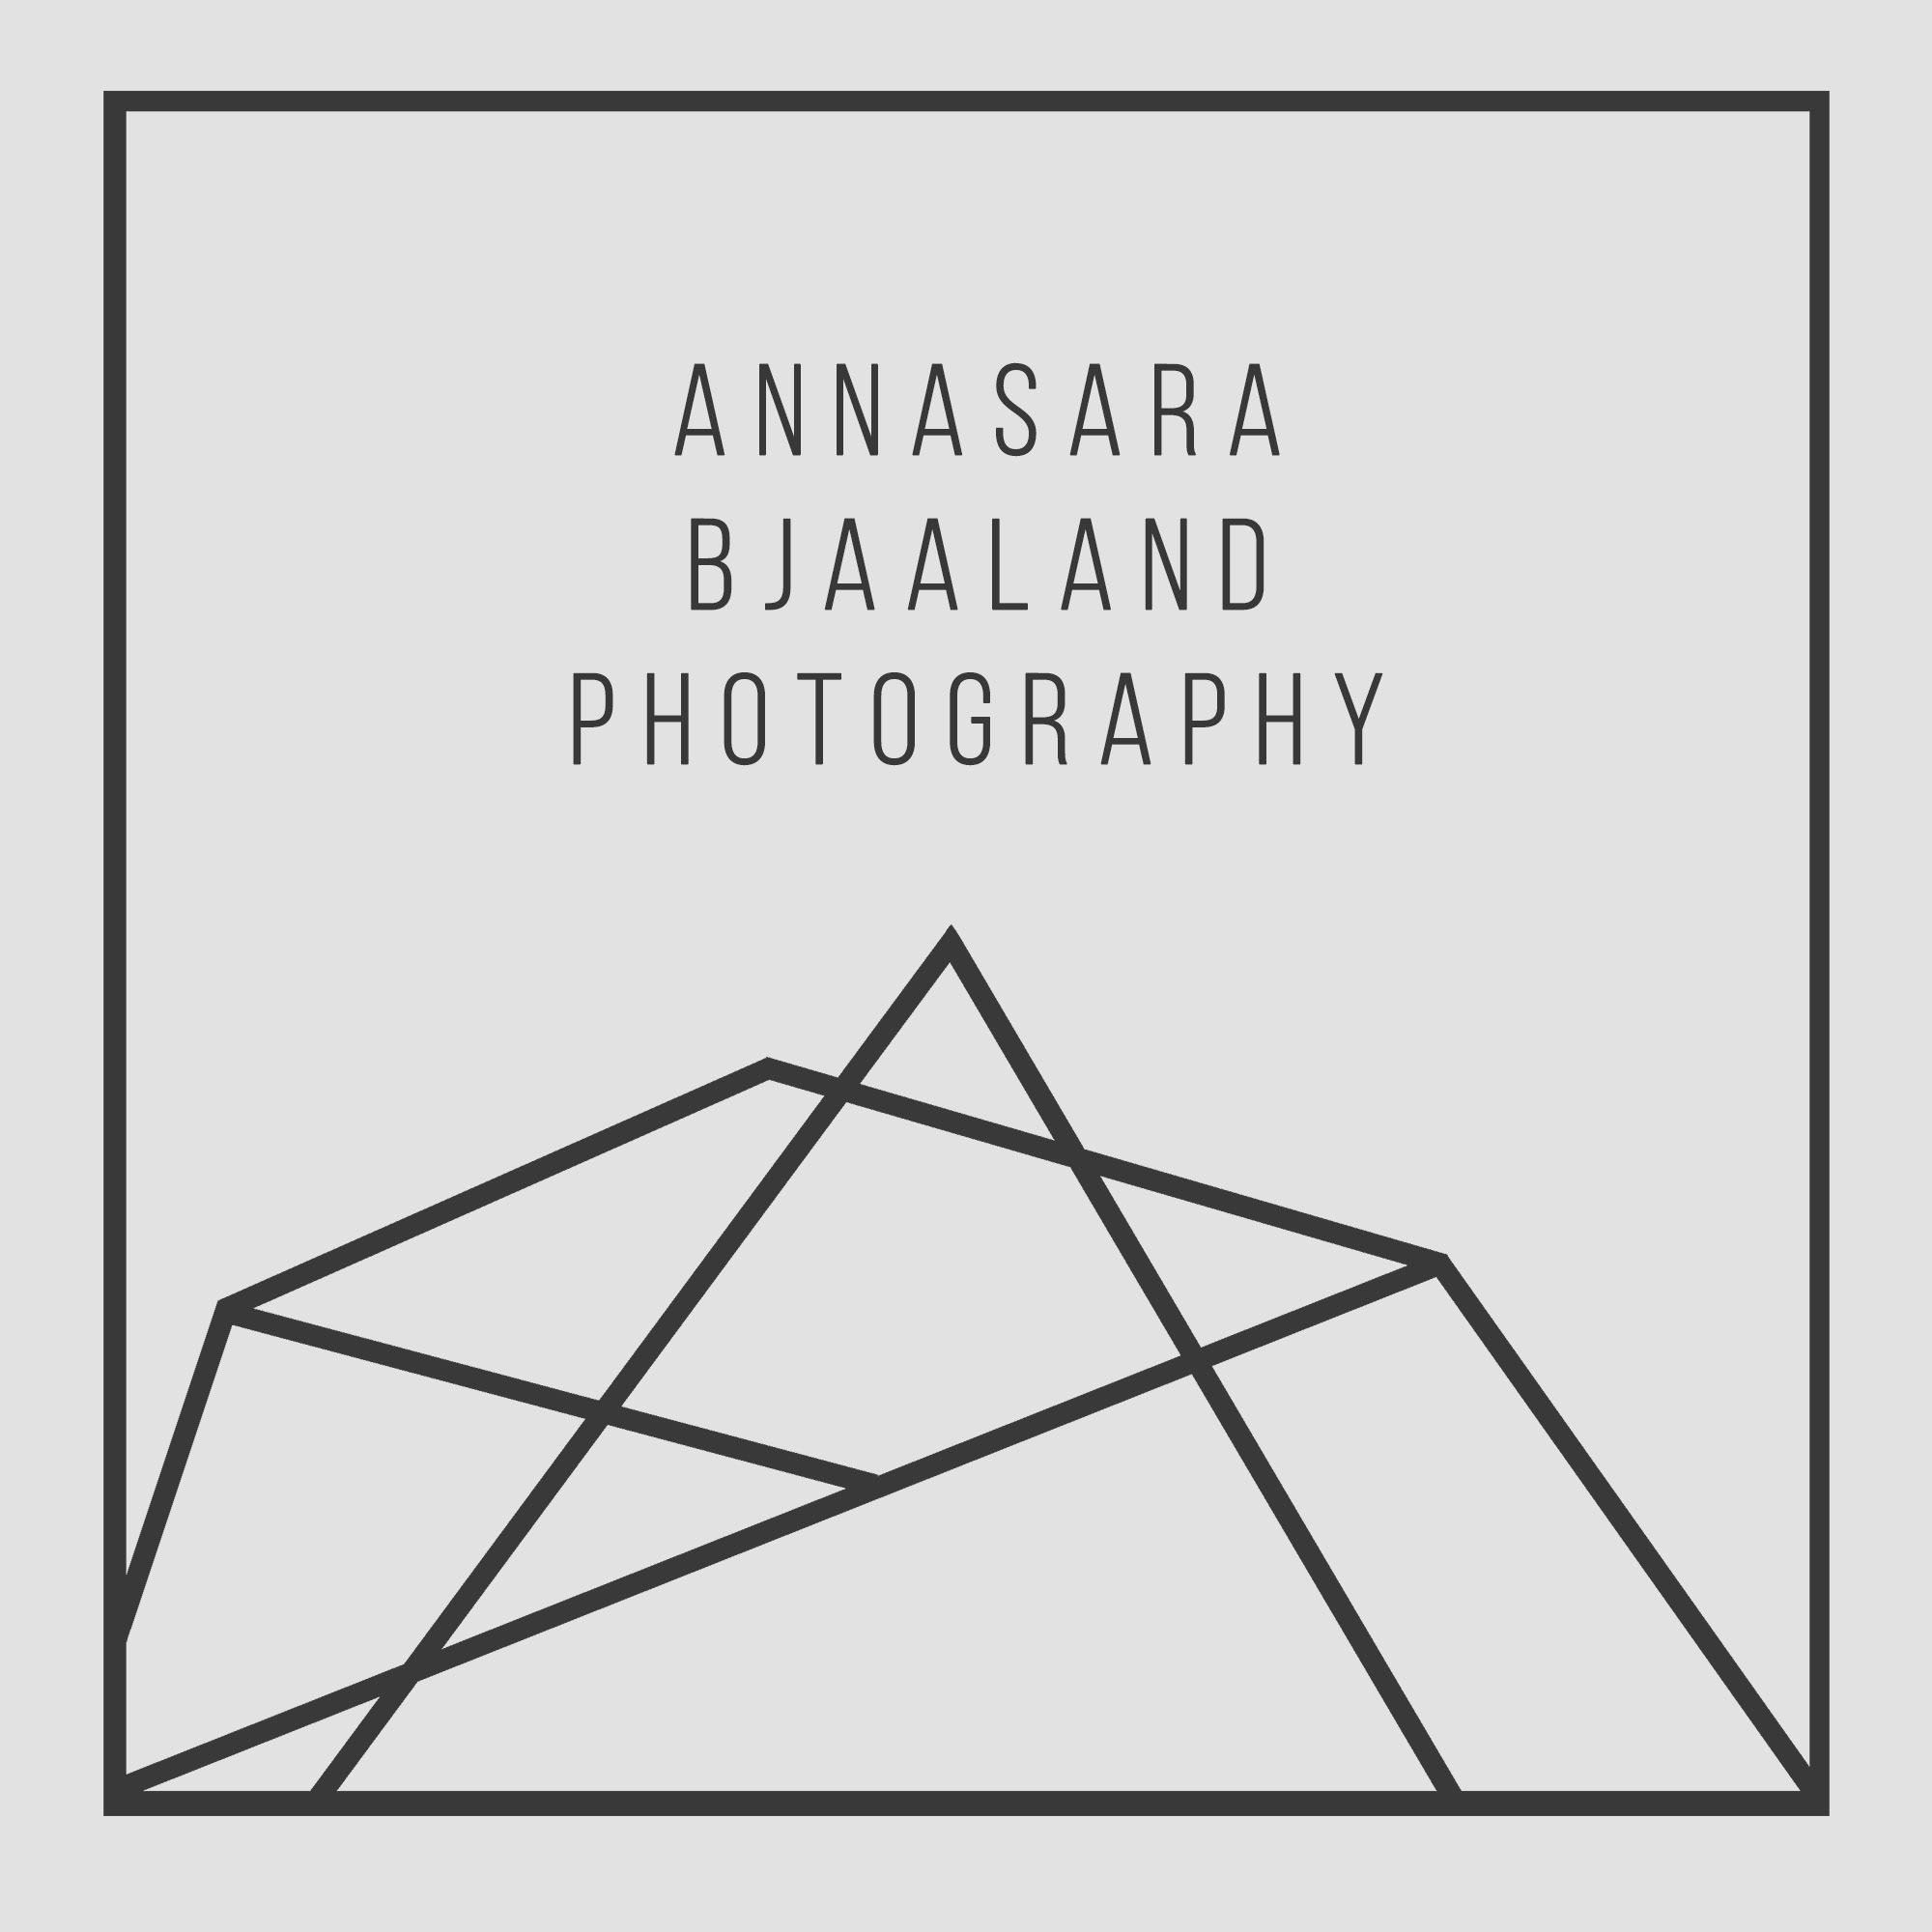 Annasara Bjaaland